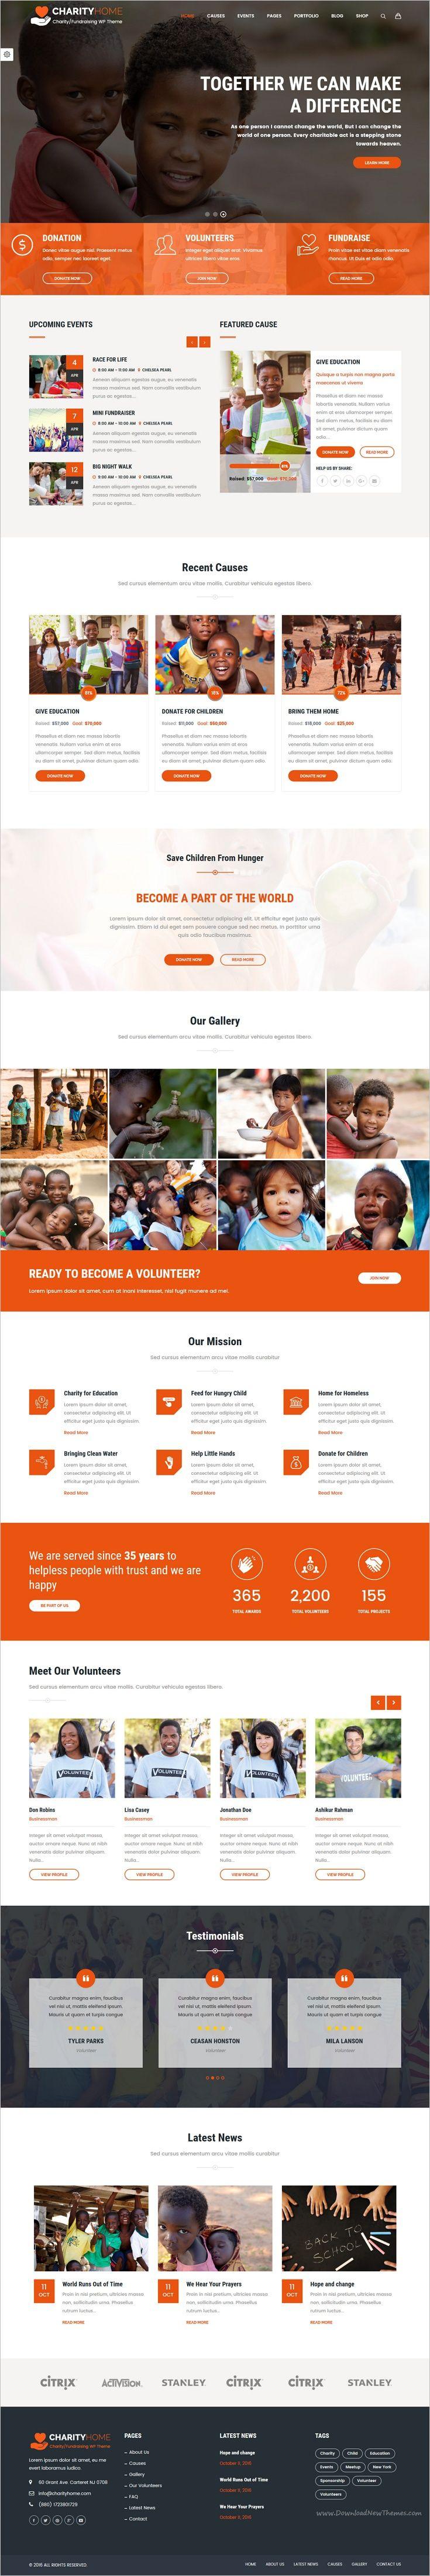 Charity Home Charity Fundraising Wordpress Theme Nonprofit Website Design Nonprofit Design Web Design Inspiration